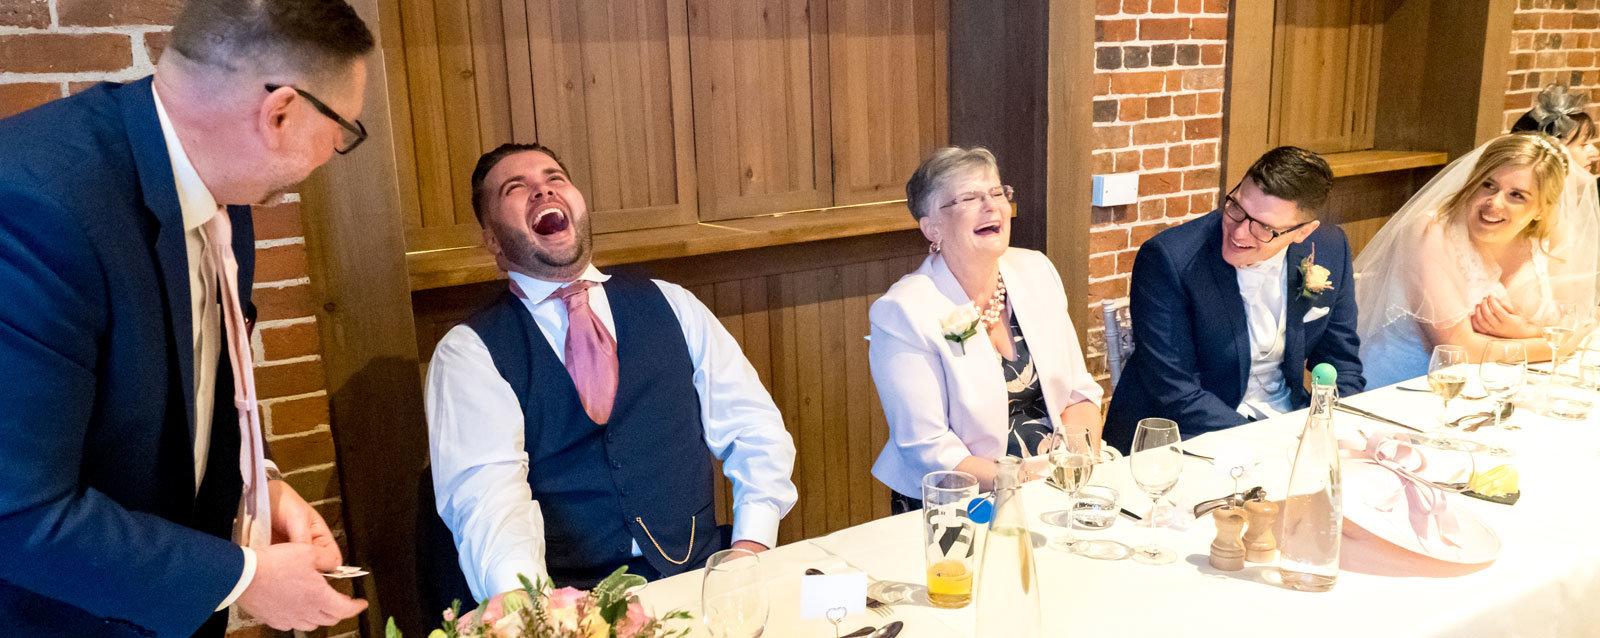 Magician entertains best man at wedding